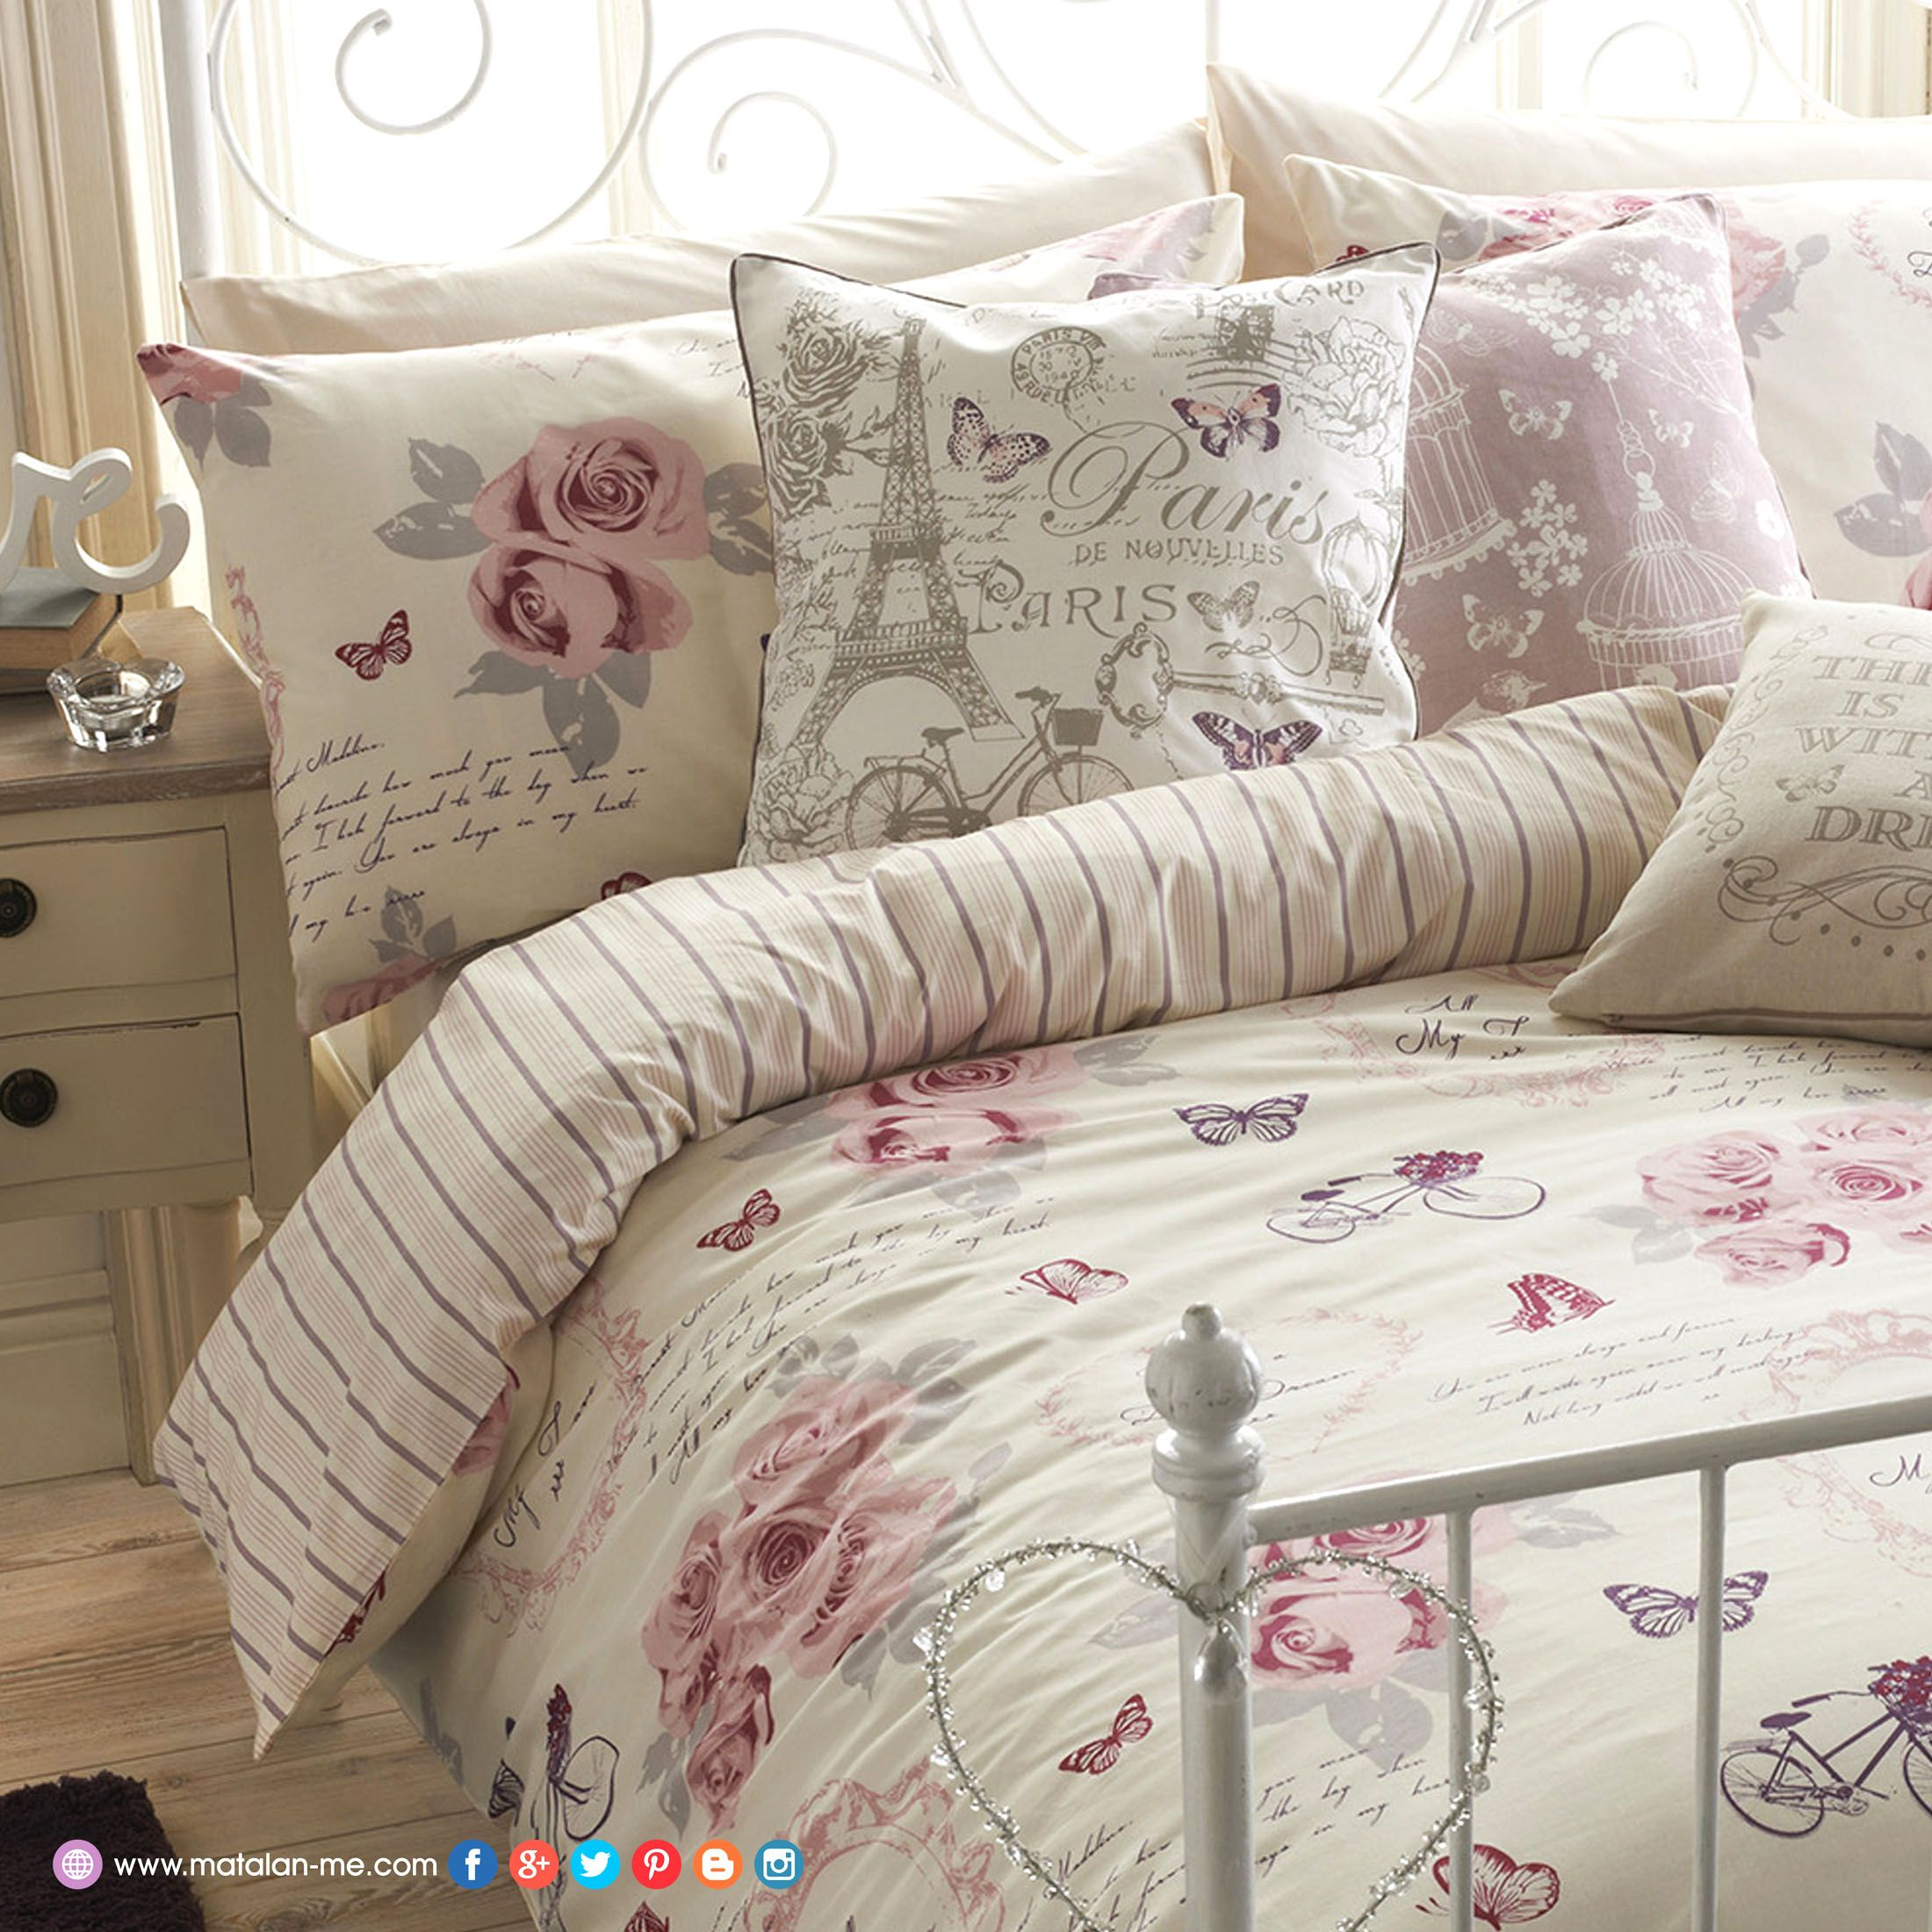 Matalan Bedding Sets That Wont Break The Budget Duvet Set Www - Matalan bedroom furniture